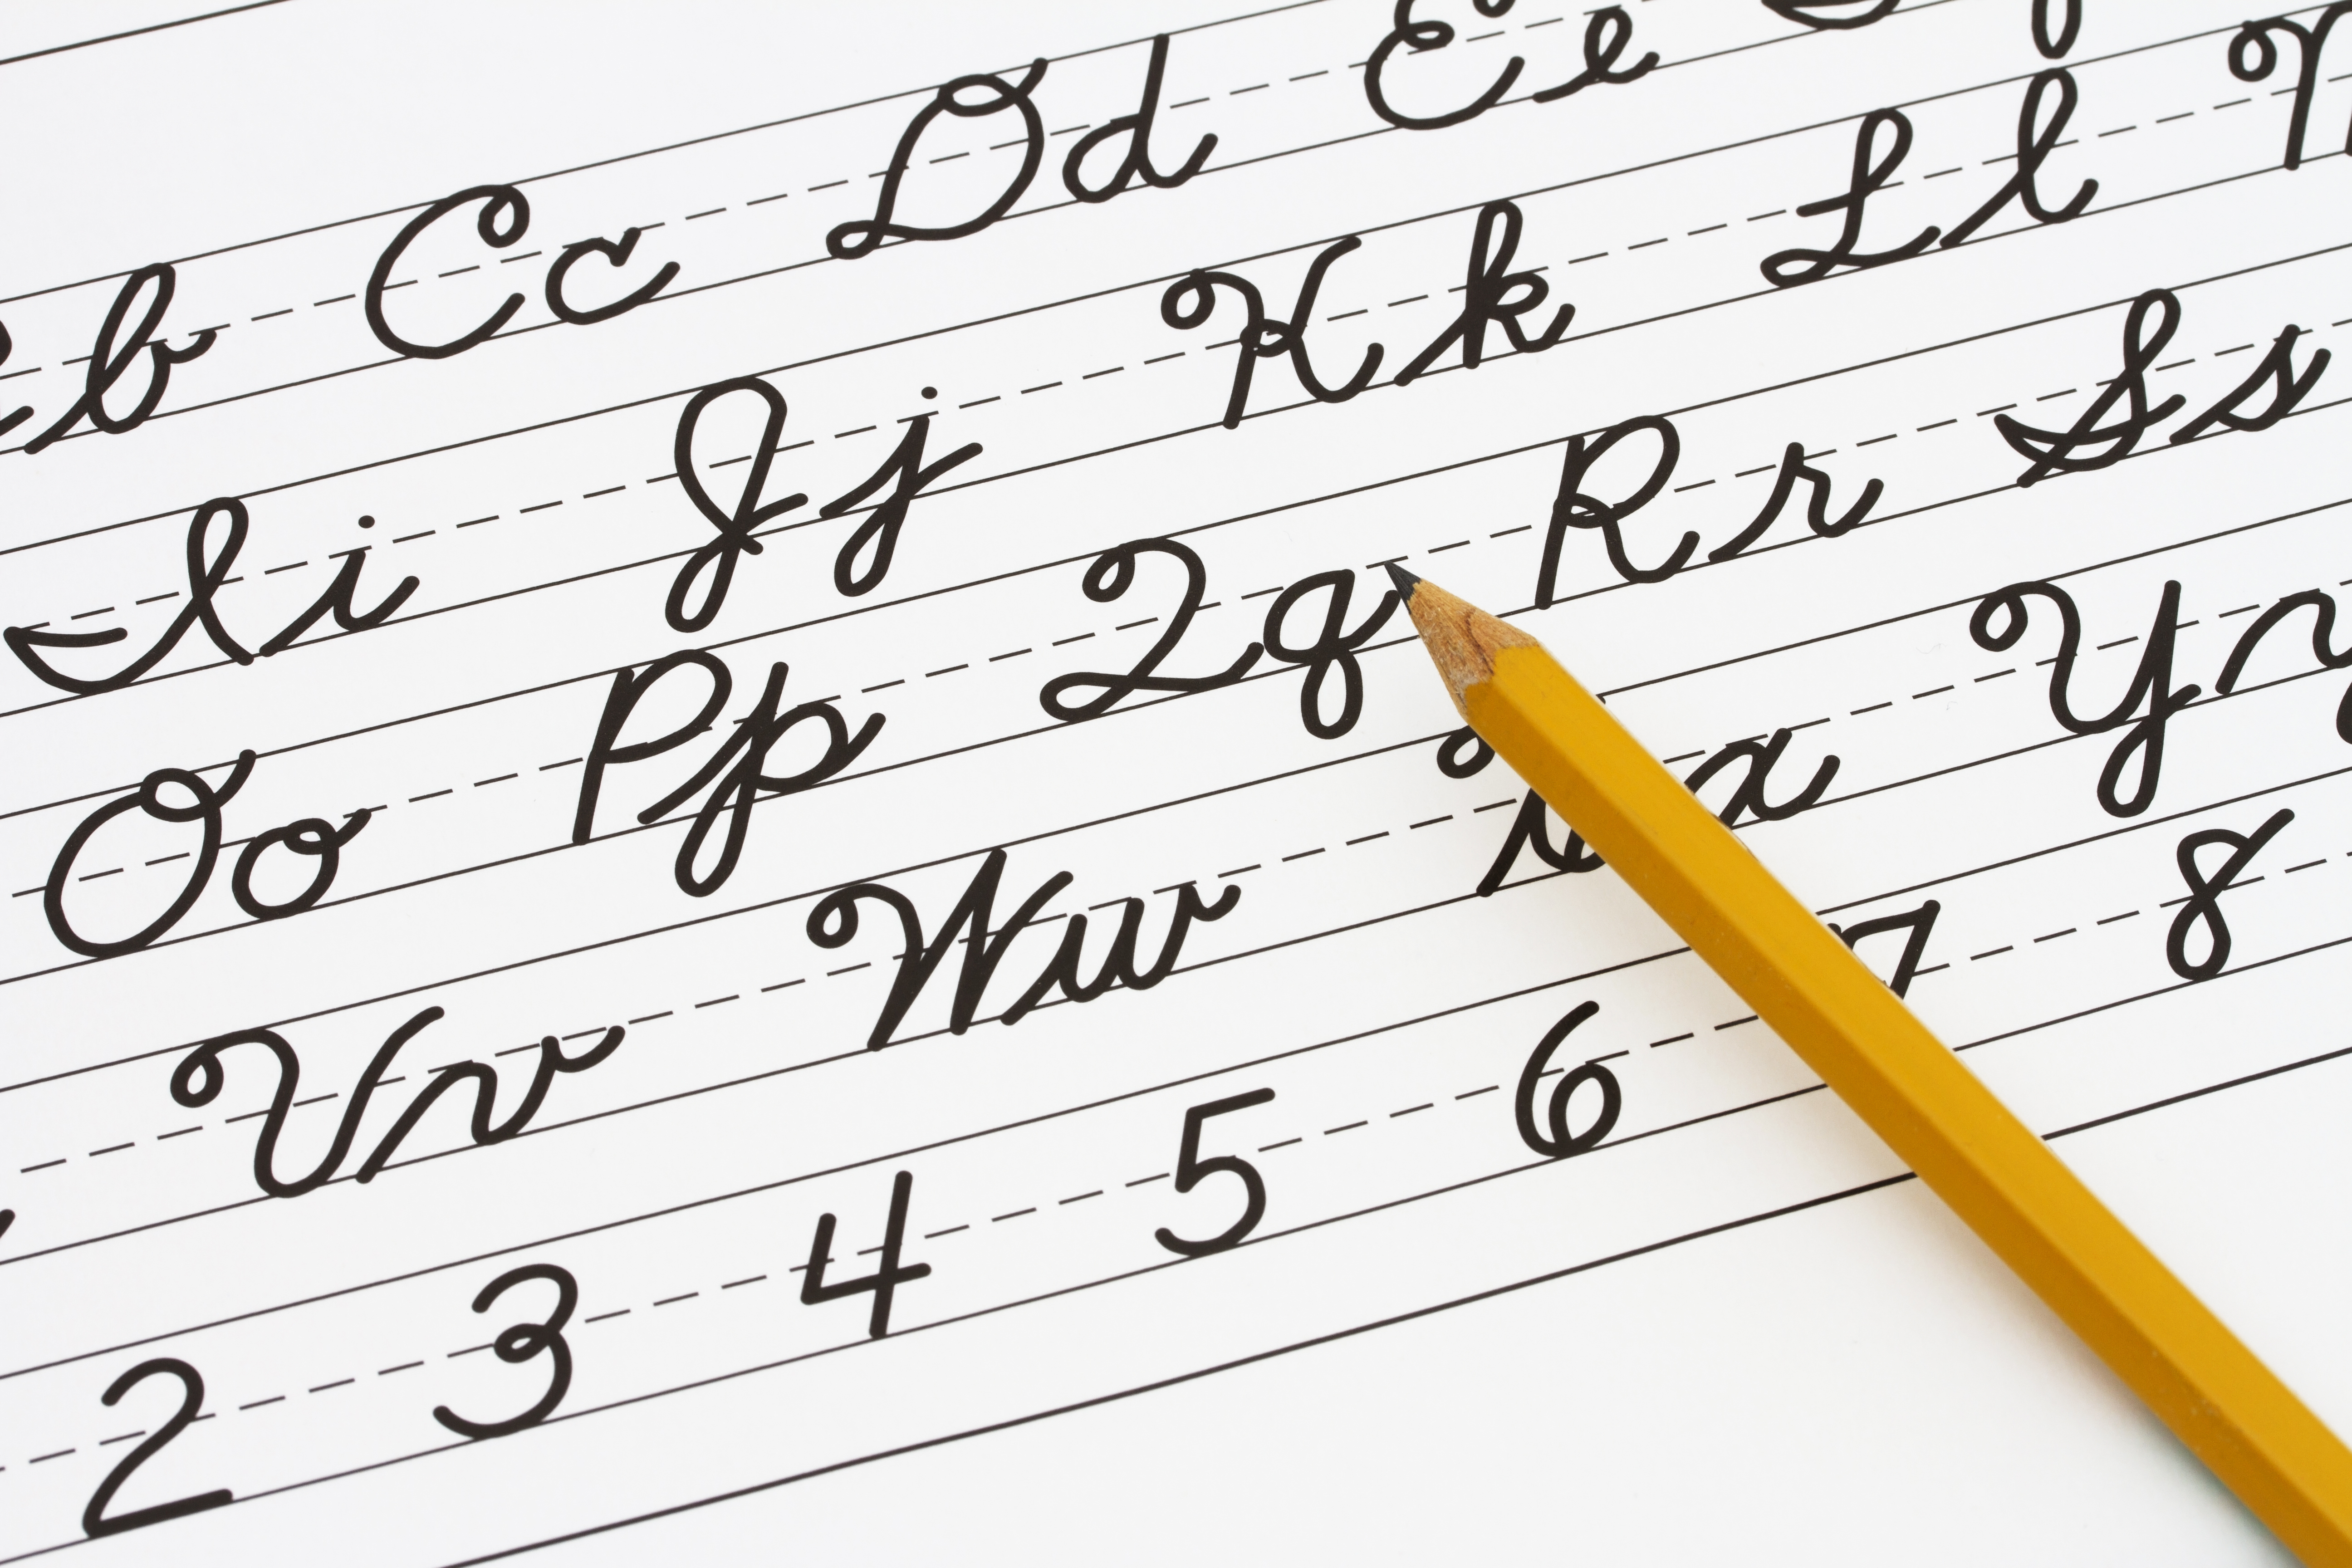 Worksheets How To Write Proper Cursive should cursive handwriting die